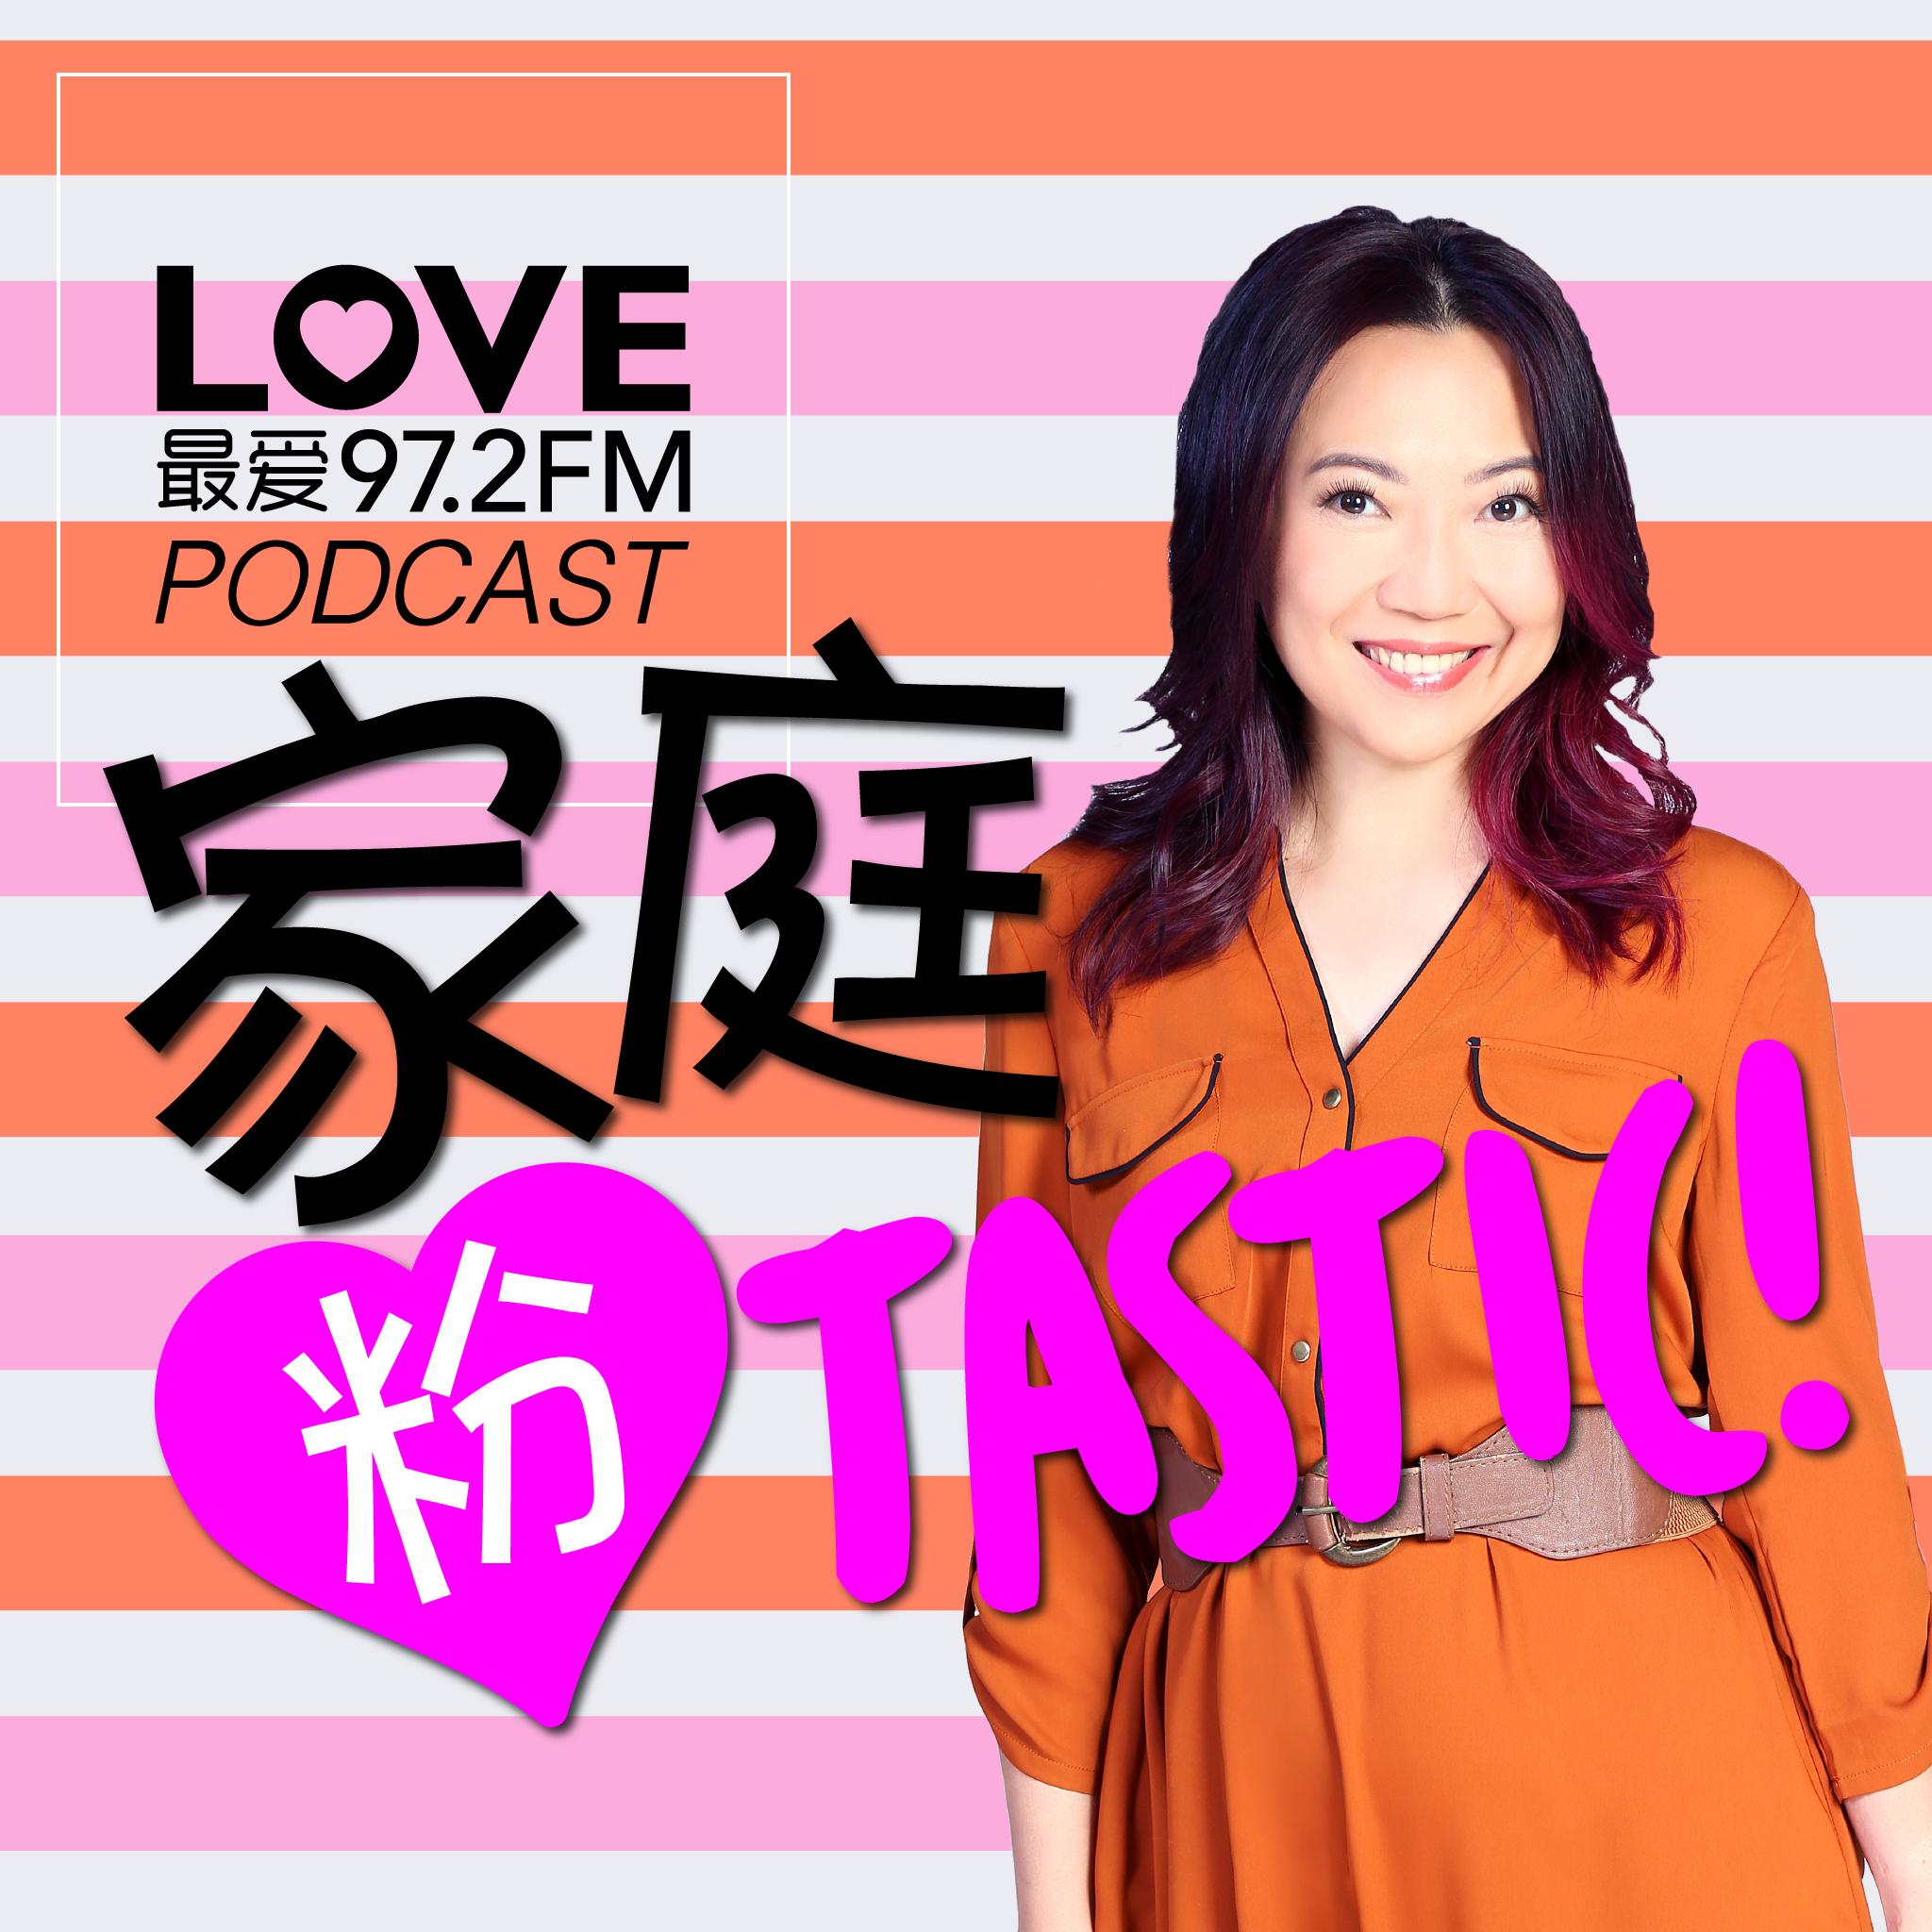 LOVE 972 家庭粉TASTIC